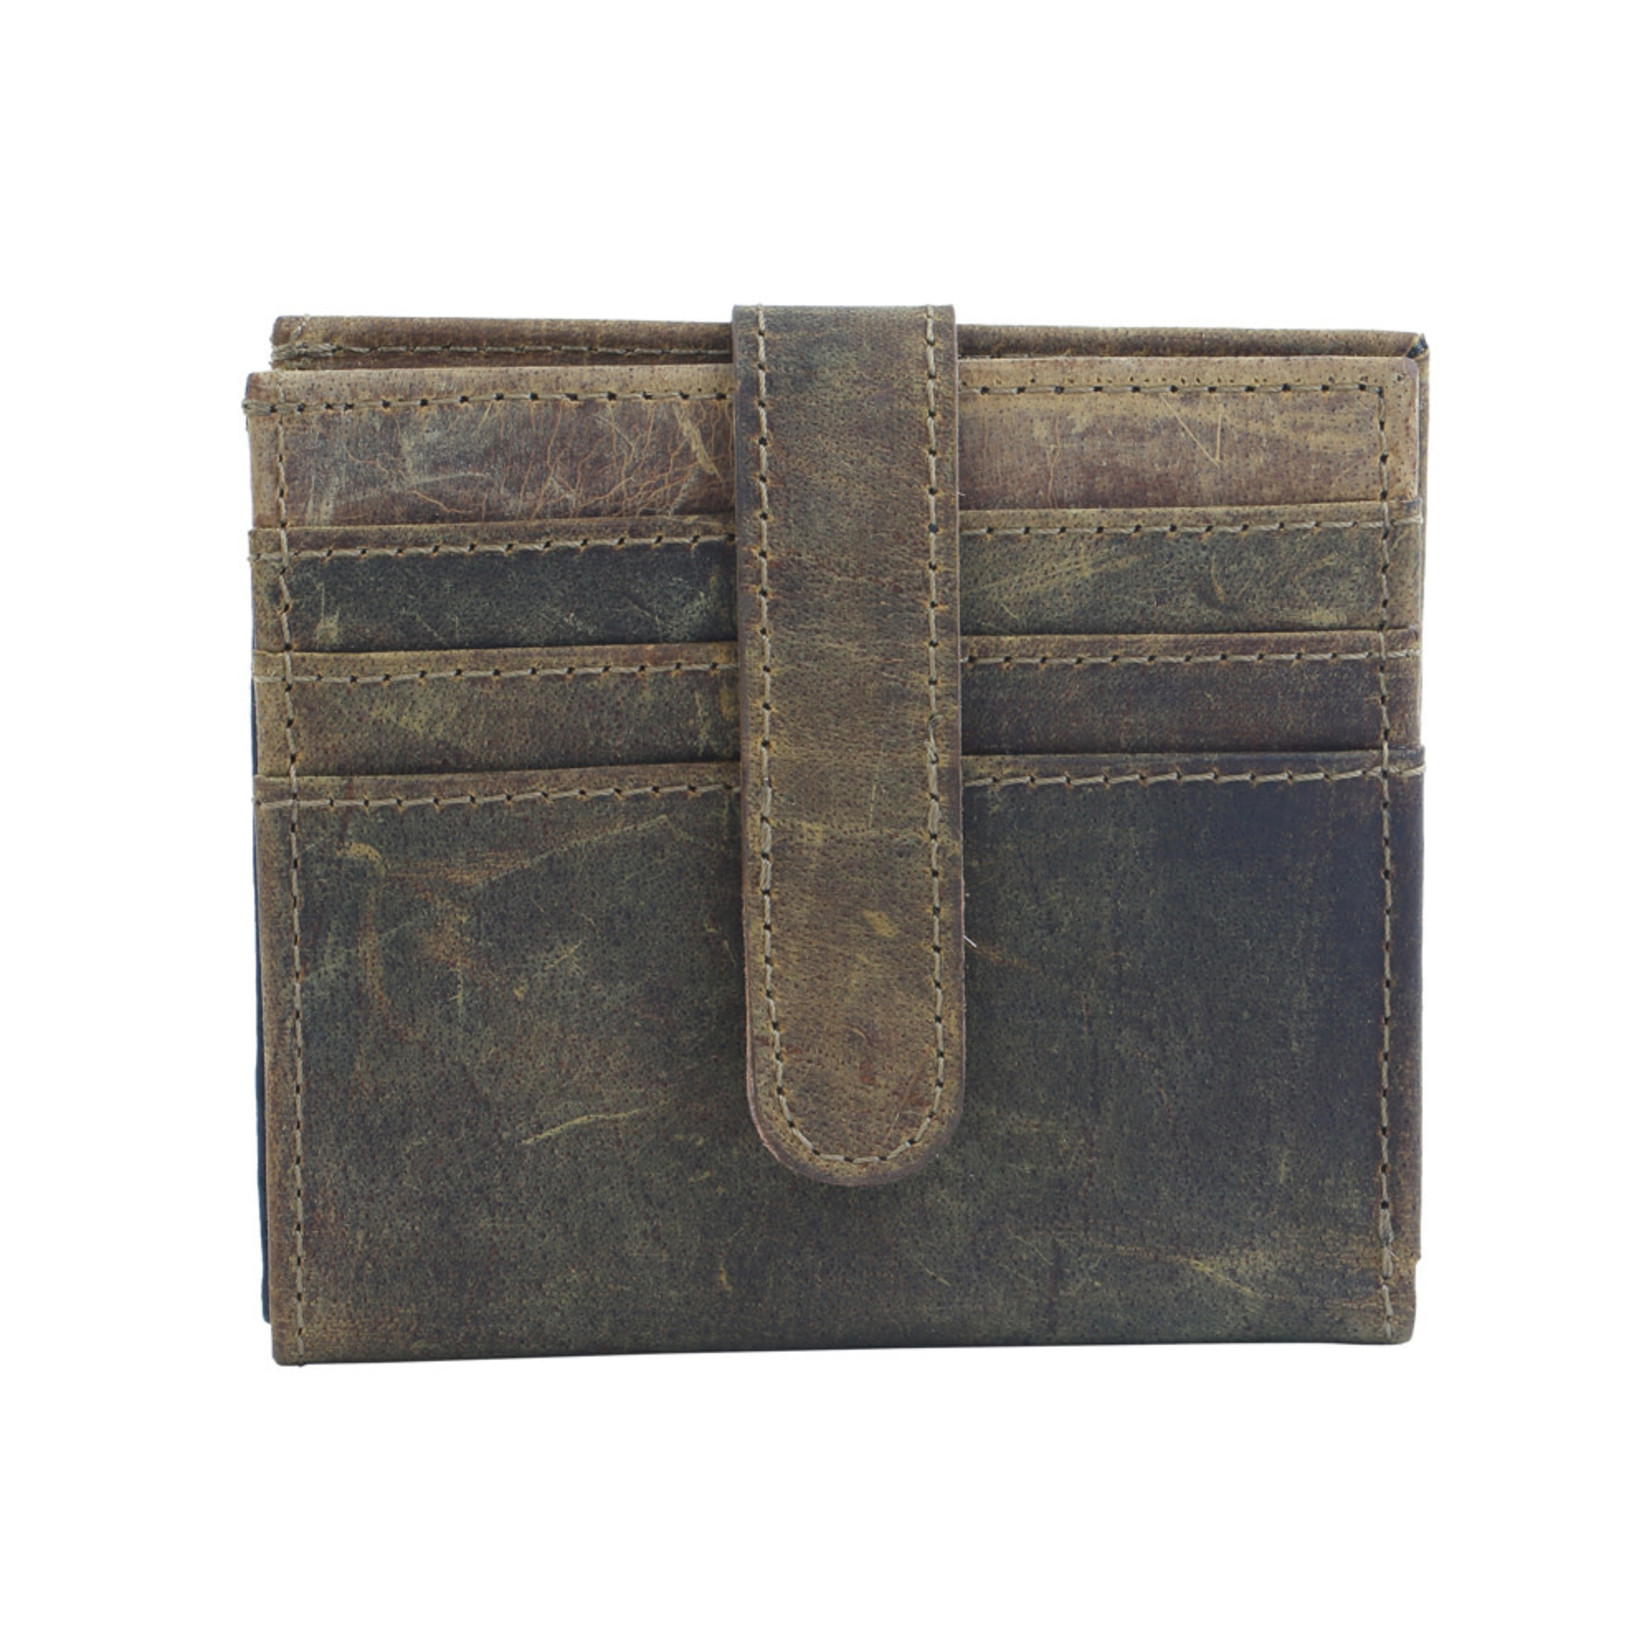 Myra Bags S-2691 Wild Woods Leather Wallet